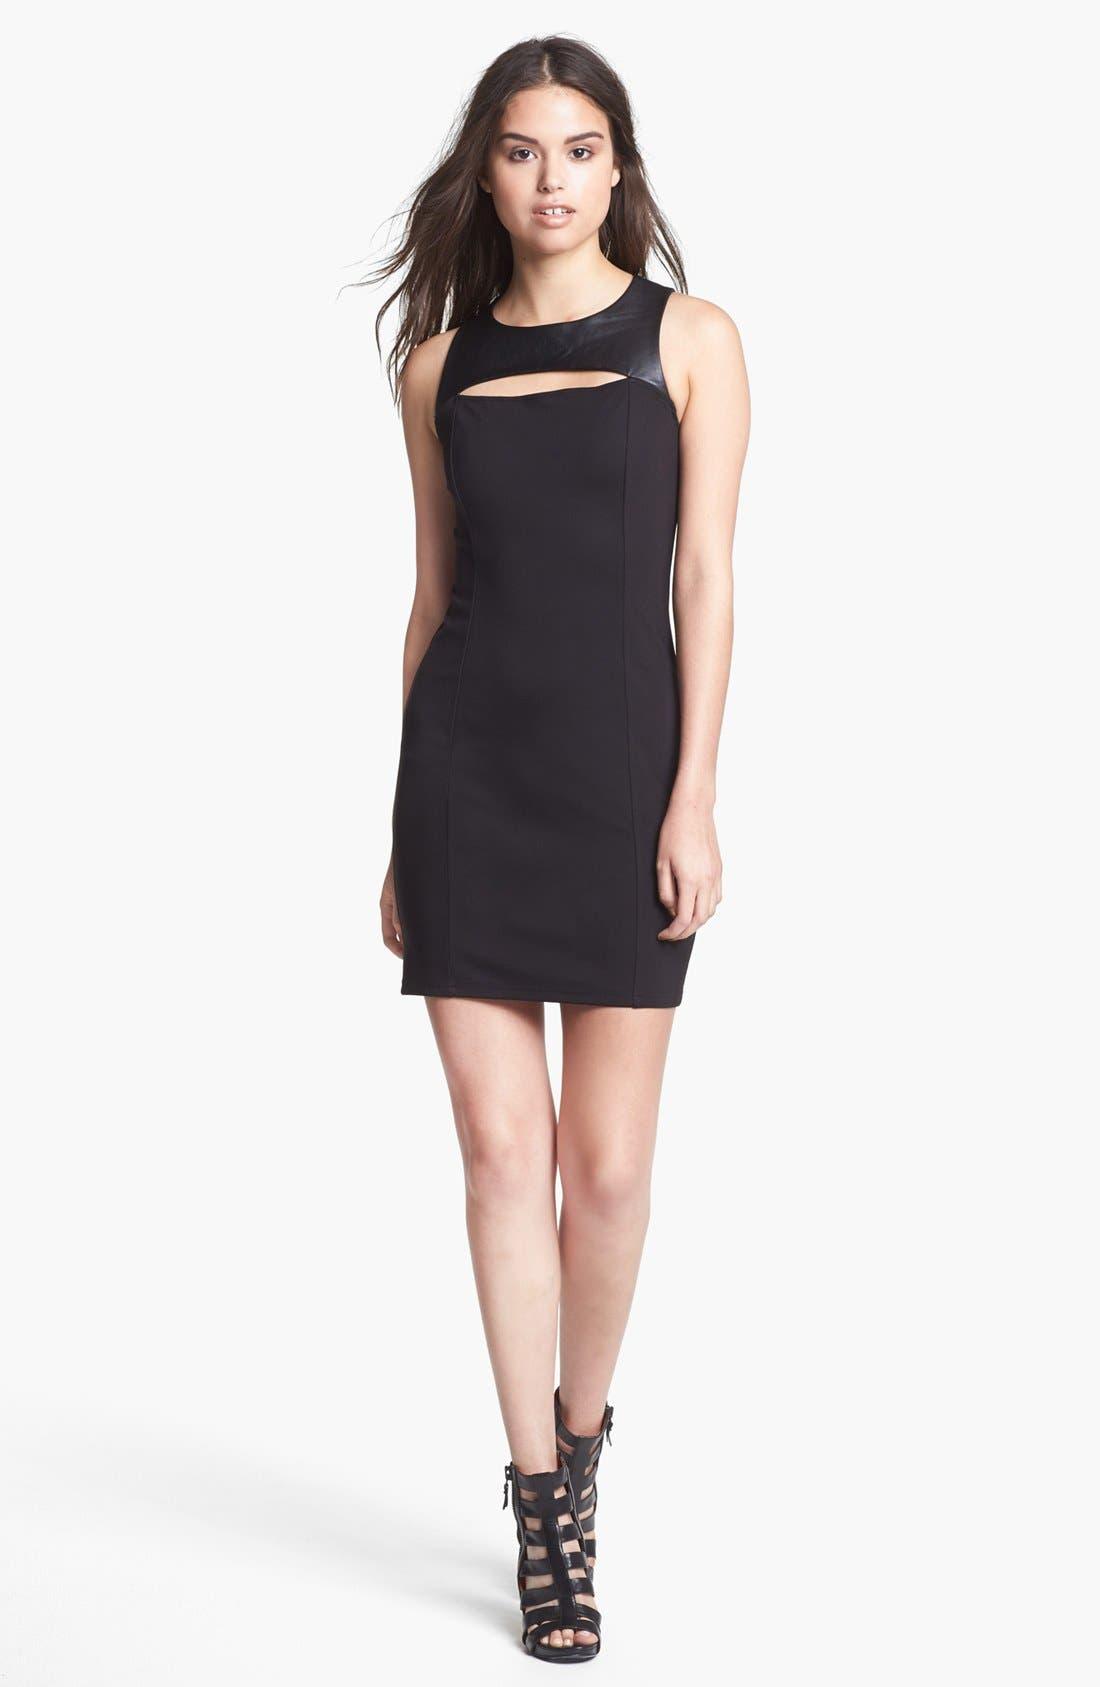 Alternate Image 1 Selected - BB Dakota 'Mai' Faux Leather Yoke Ponte Sheath Dress